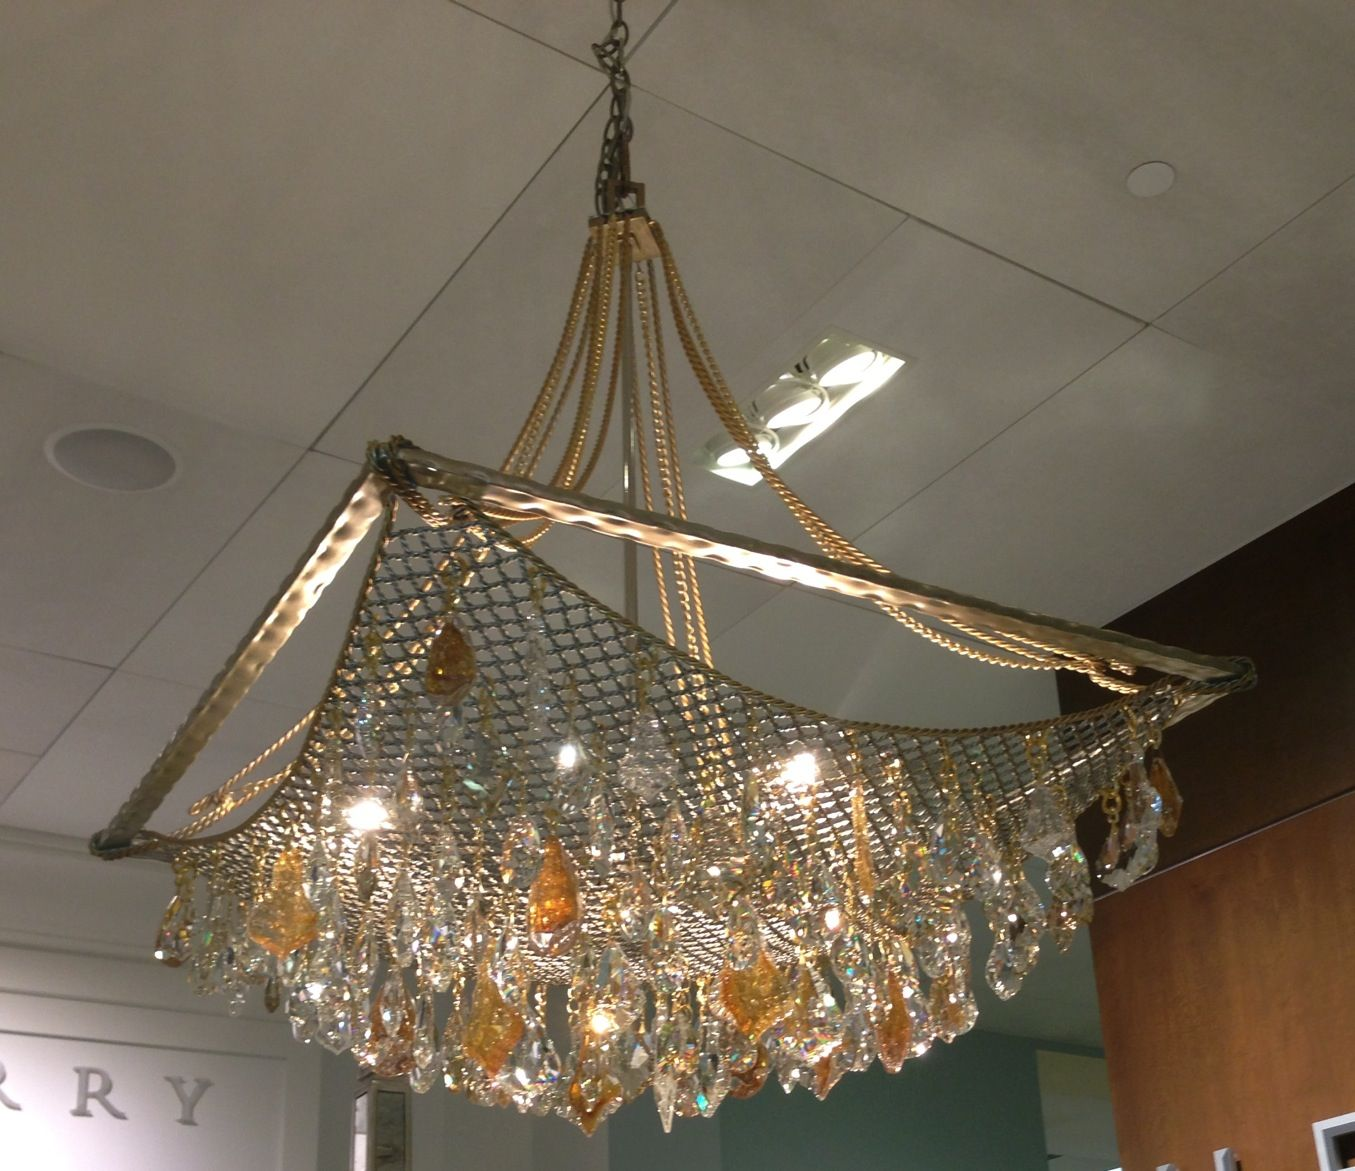 Amazing chandelier seen at henredon furniture store for Fishing net decor ideas